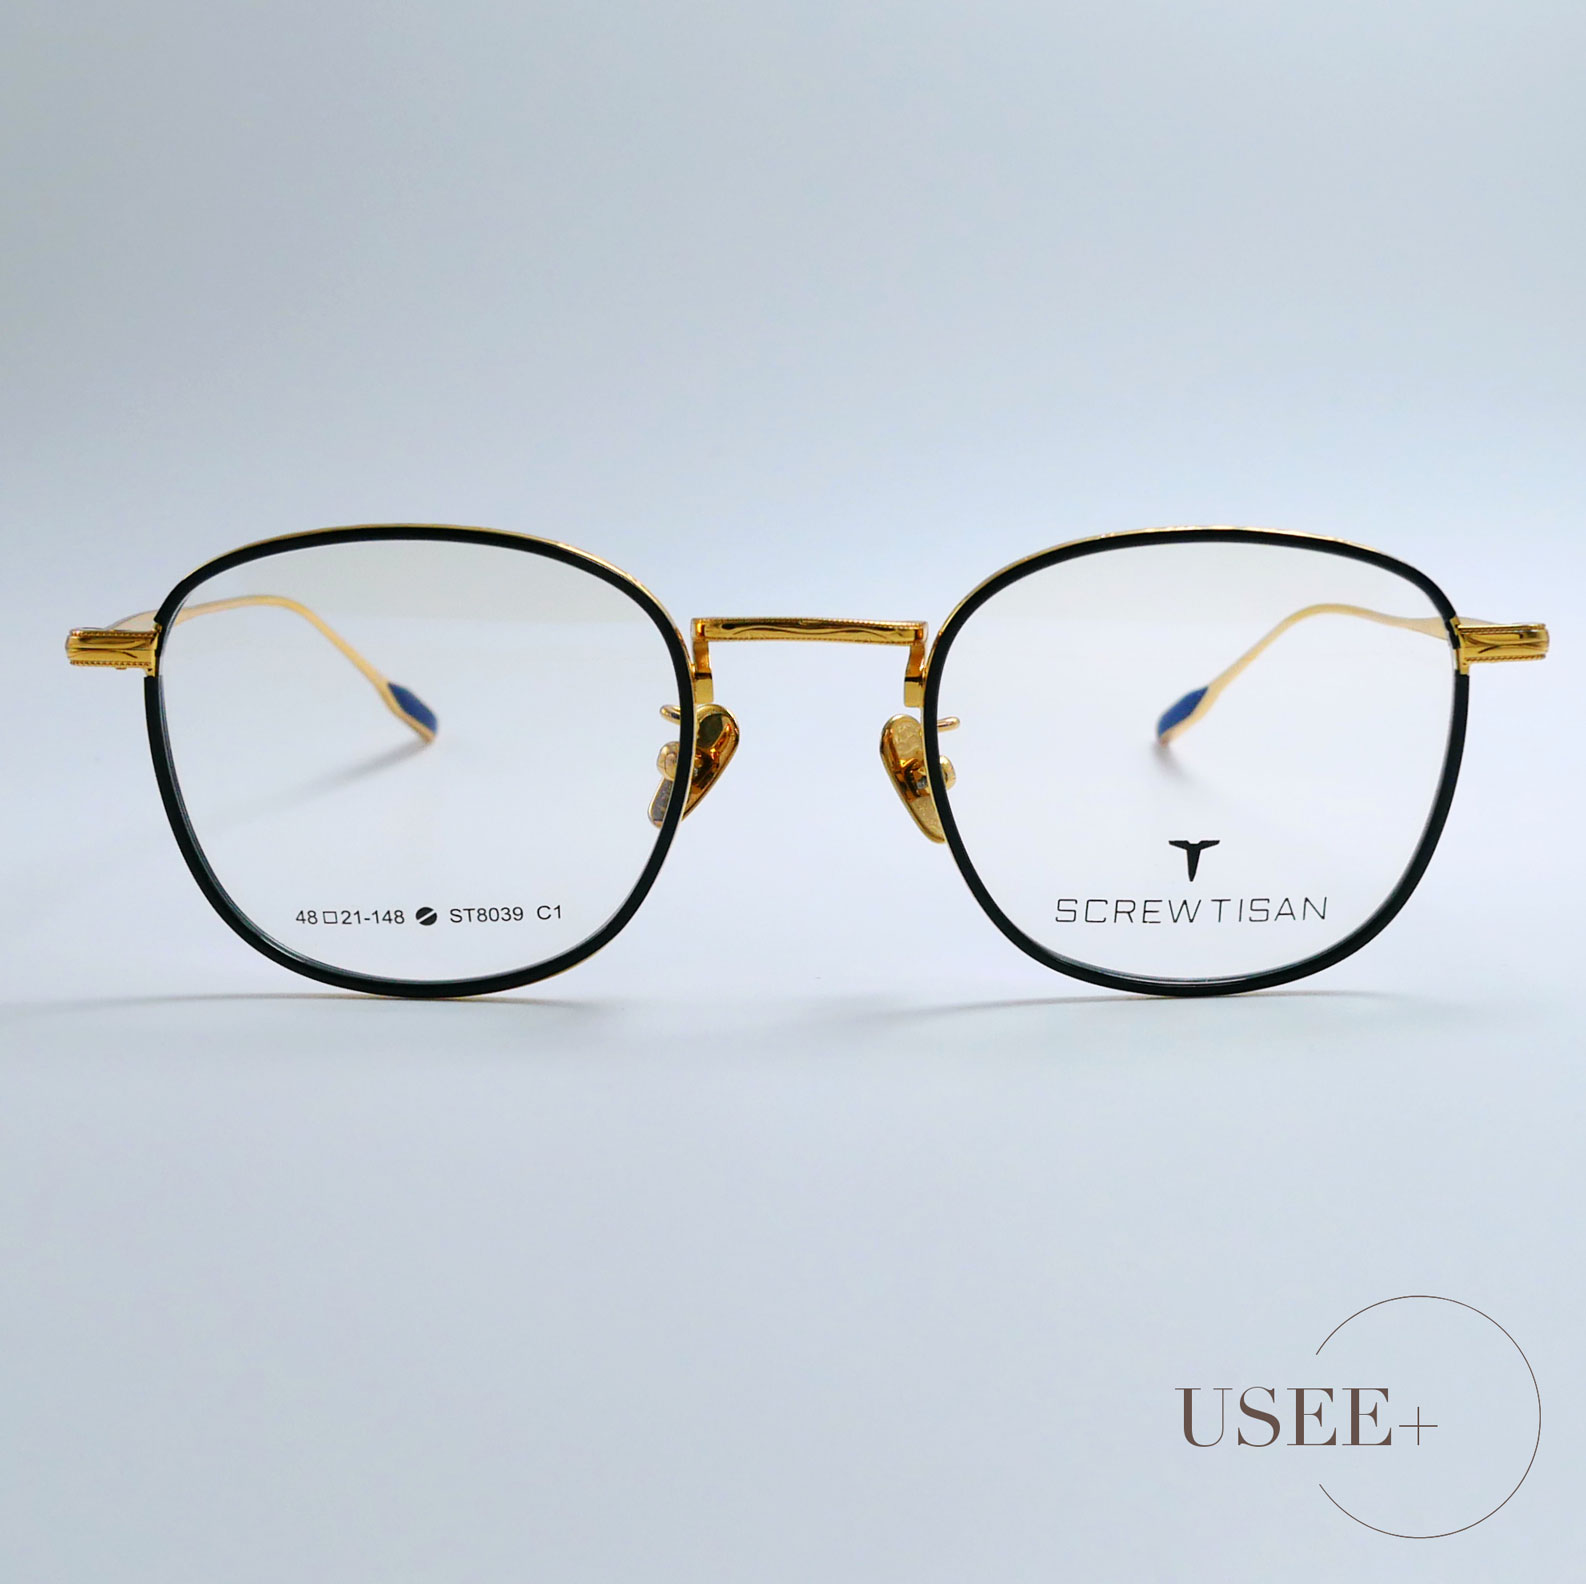 USEE+ 有晰眼镜设计师时尚潮流复古光学眼镜